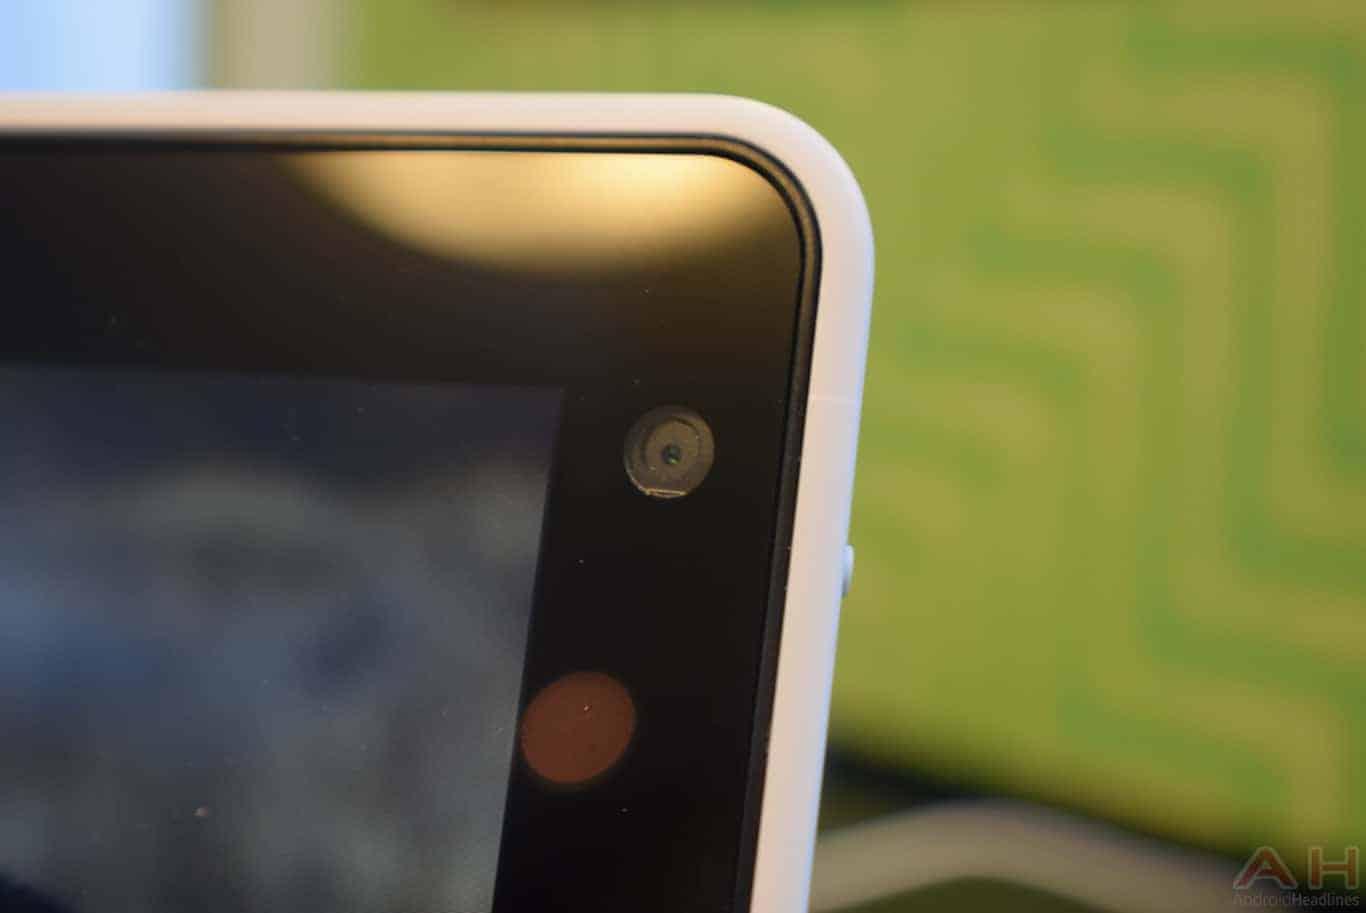 Lenovo Smart Display CES 2018 AM AH 0063